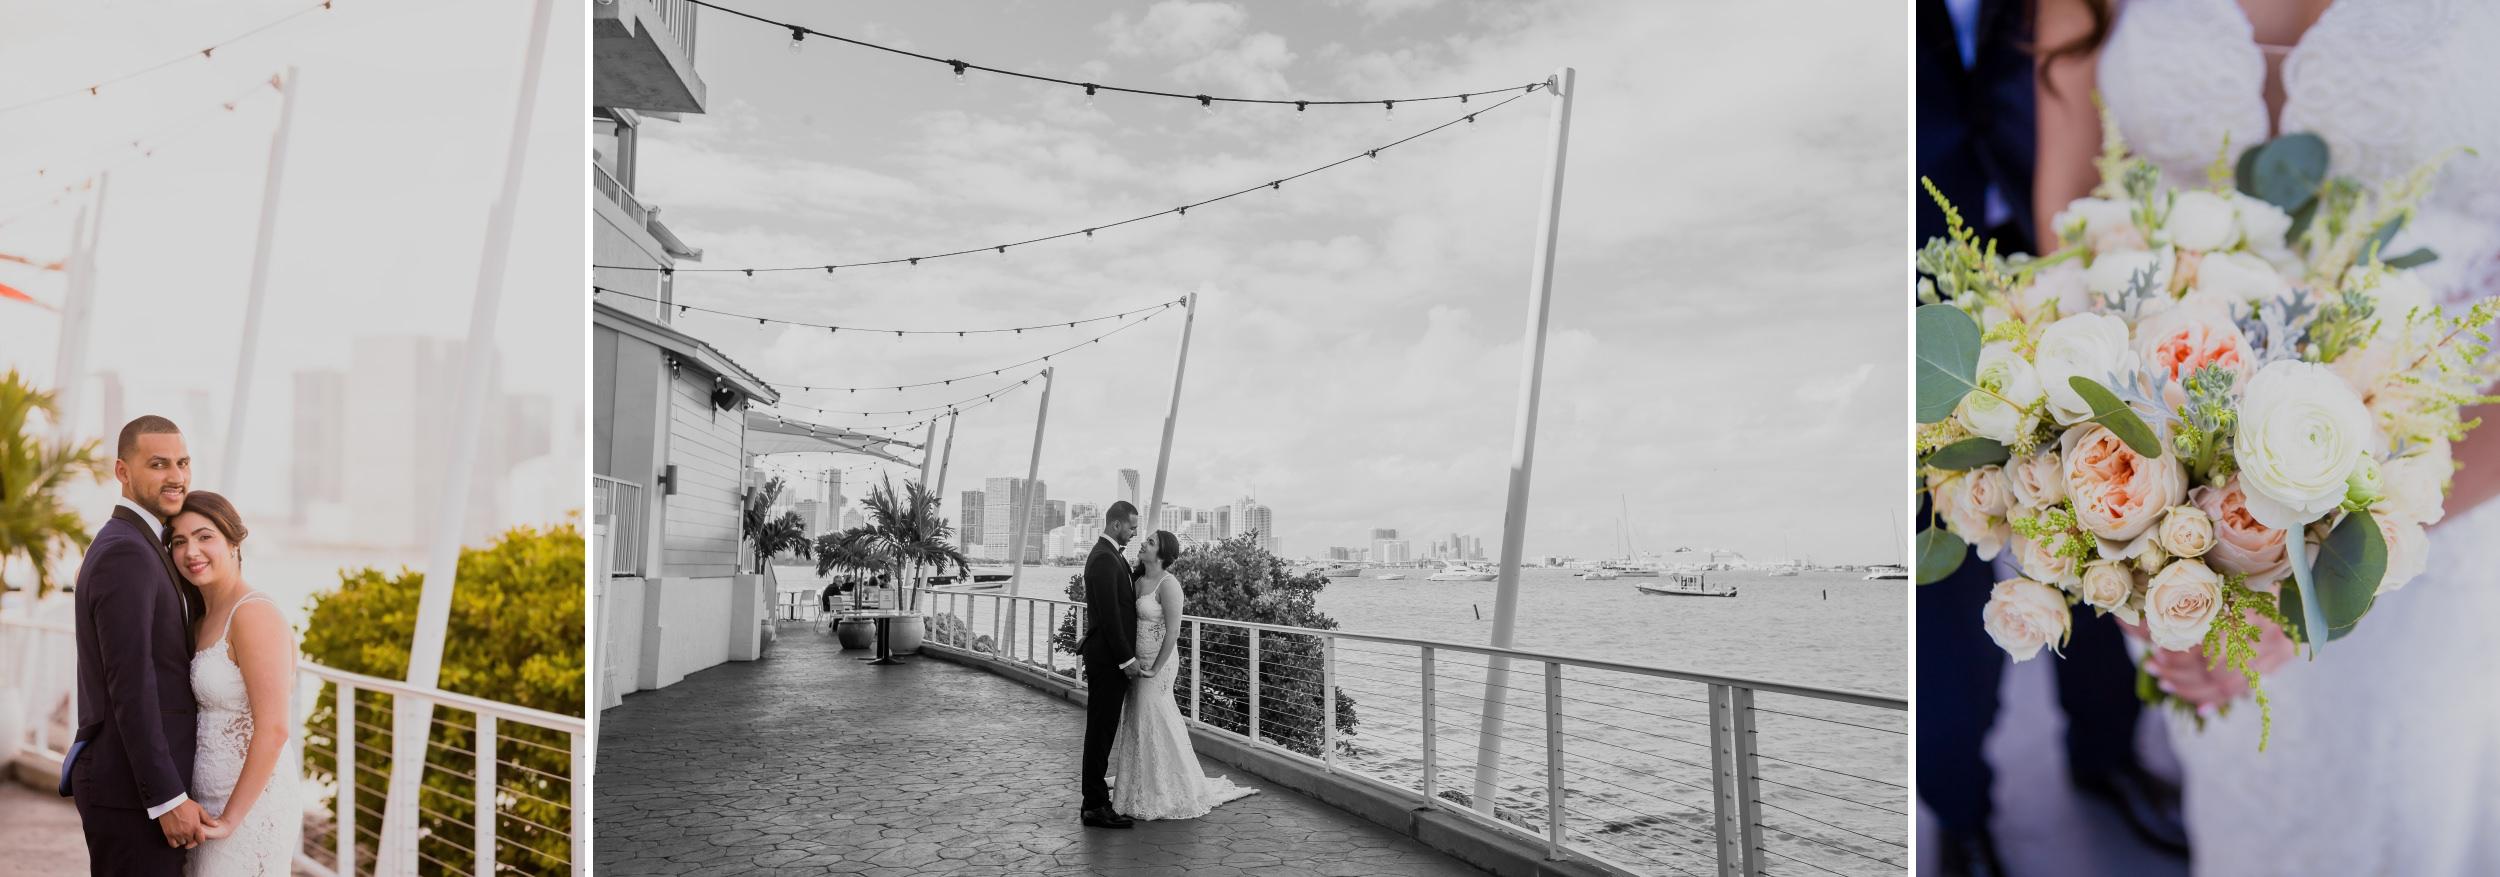 Wedding - Rusty Pelican - Key Biscayne - Santy Martinez Photography 24.jpg